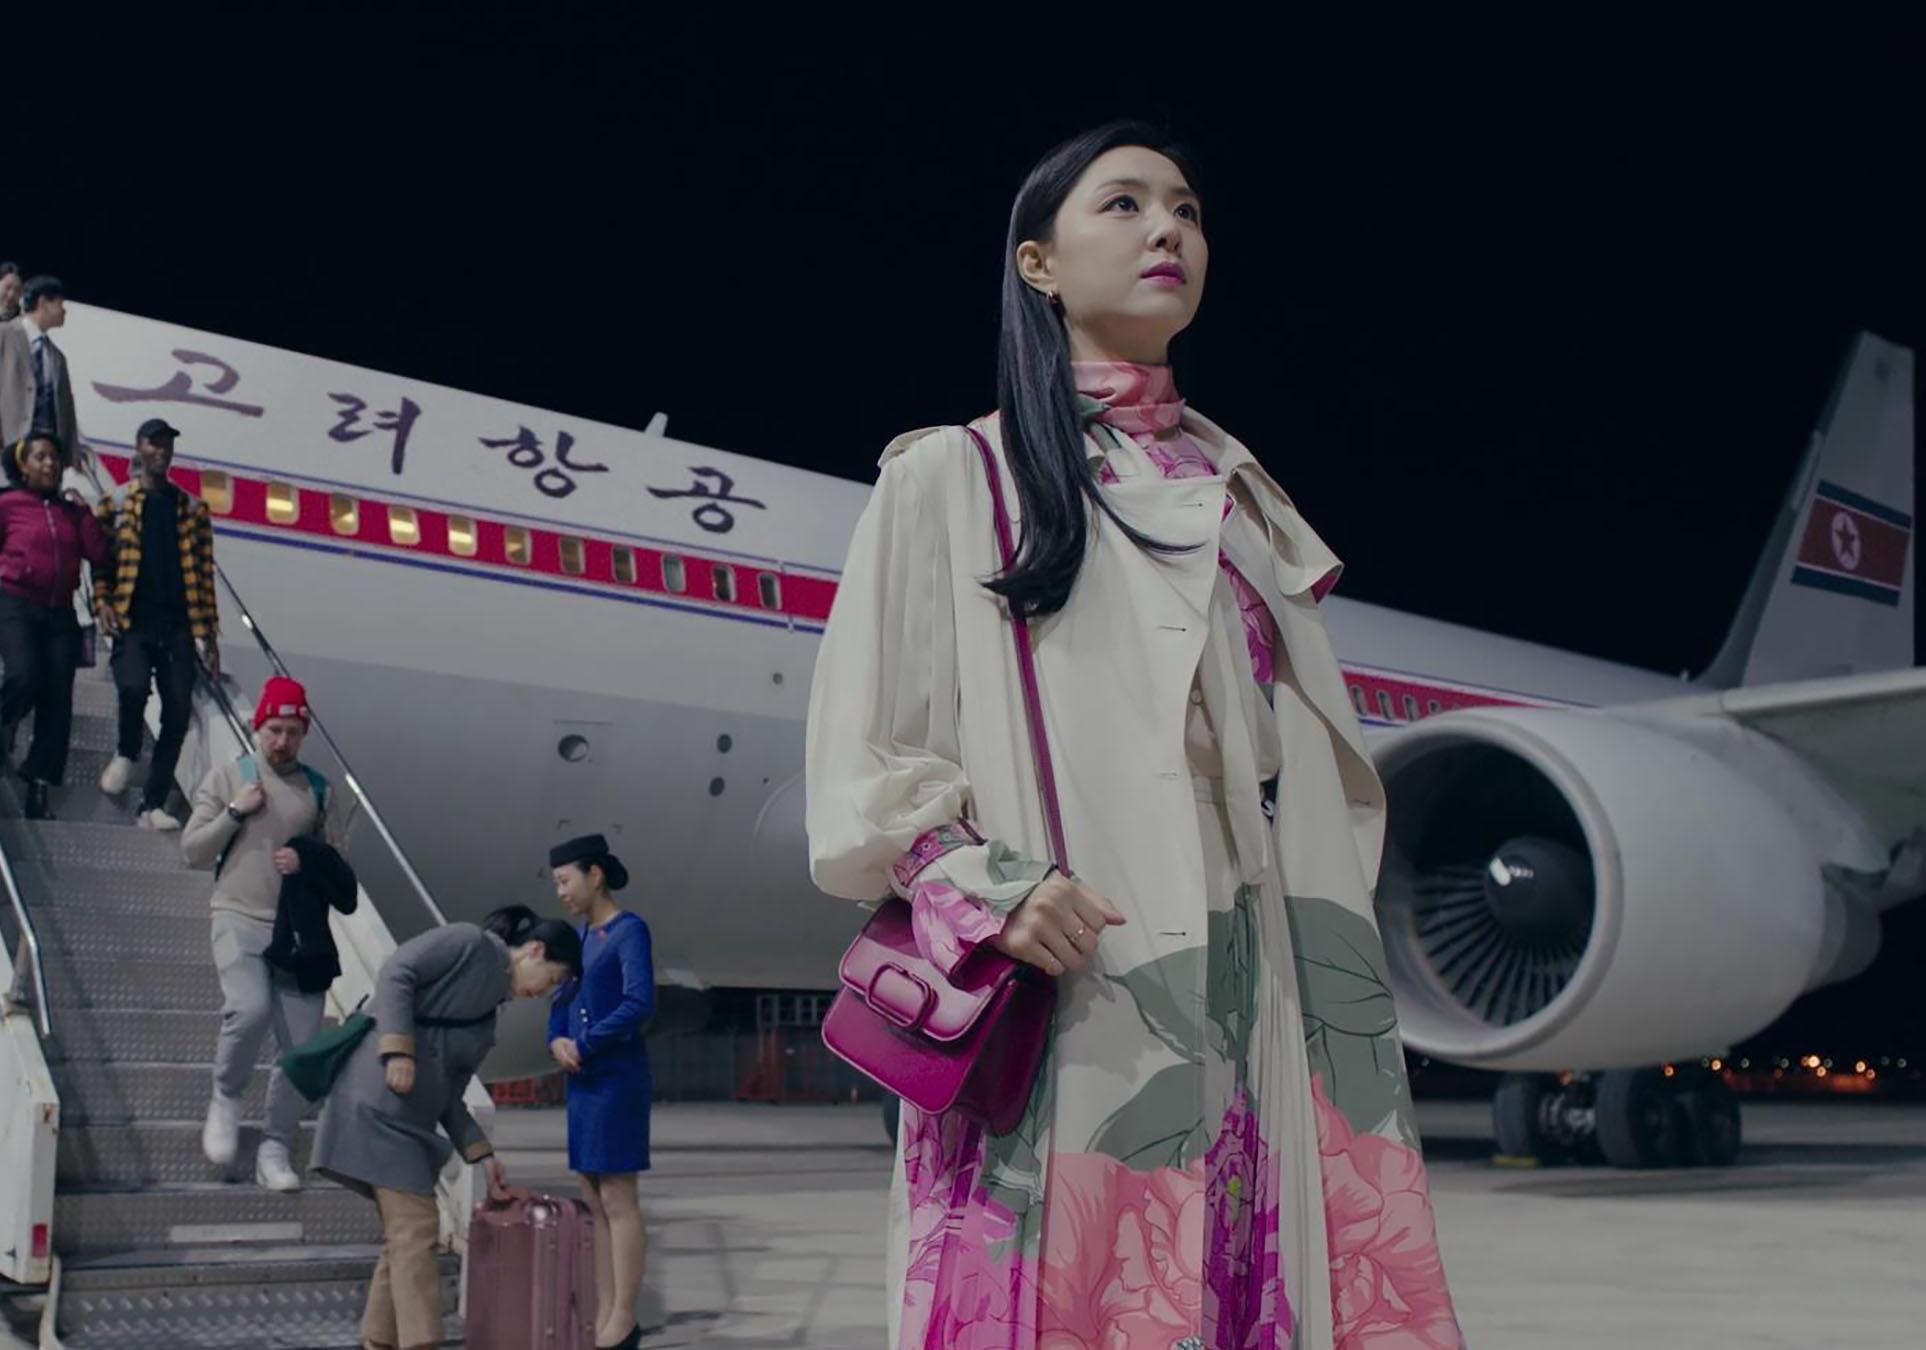 thời trang trong phim crash landing on you - seo dan 3